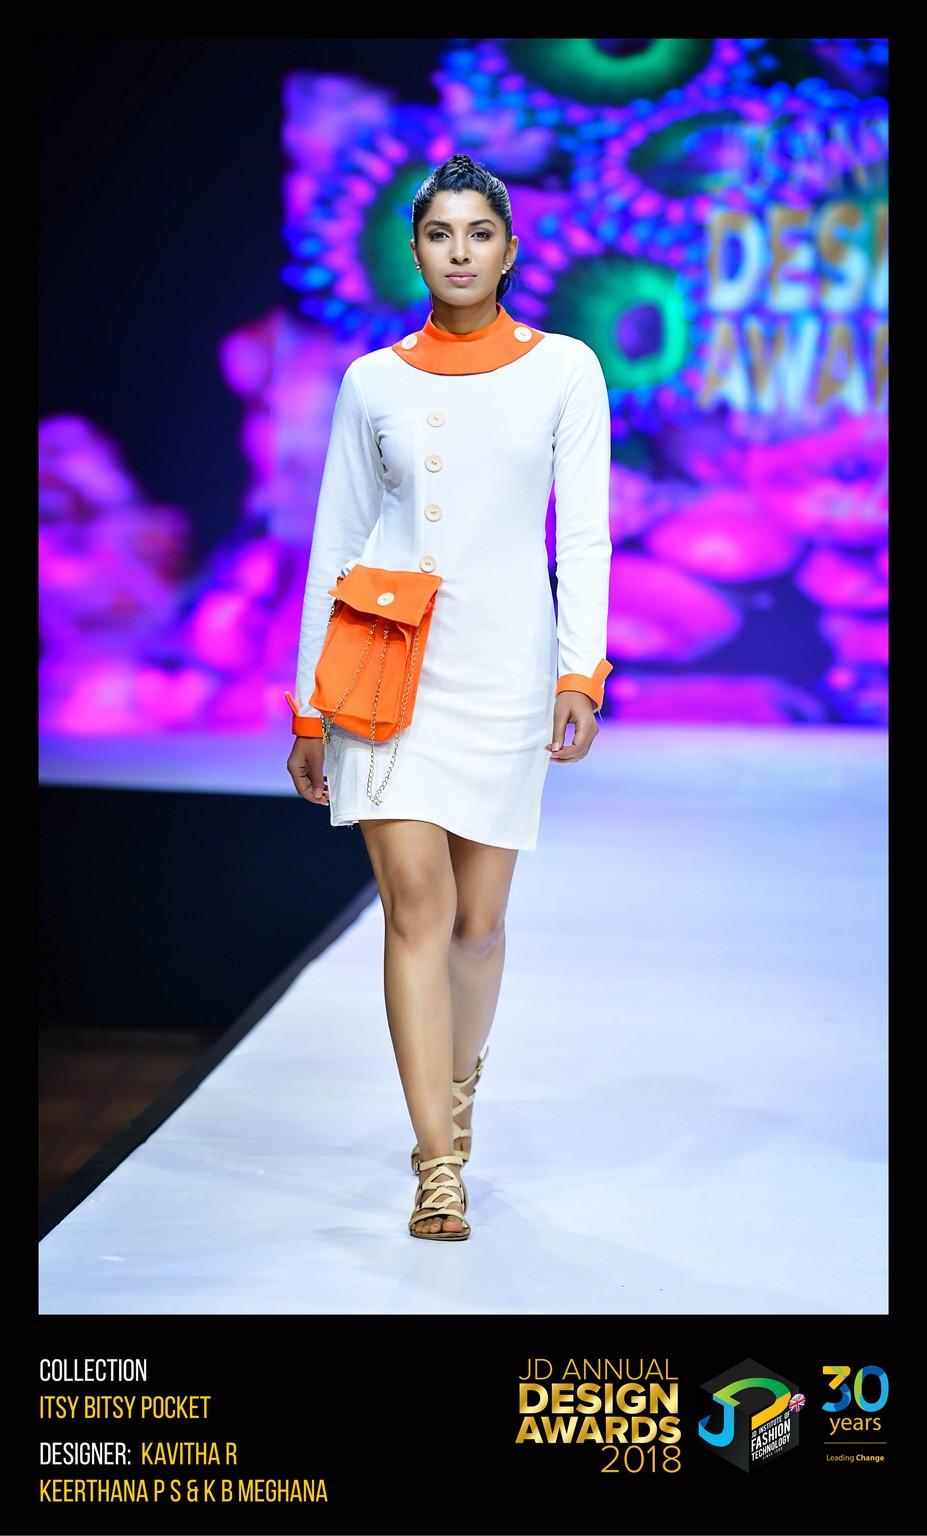 Itsy Bitsy Pocket Dress – Change – JD Annual Design Awards 2018   Designer: Kavitha, Keertana and Meghana   Photography : Jerin Nath (@jerin_nath) itsy bitsy pocket dress - ITSY BITSY POCKET1 - Itsy Bitsy Pocket Dress – Change – JD Annual Design Awards 2018